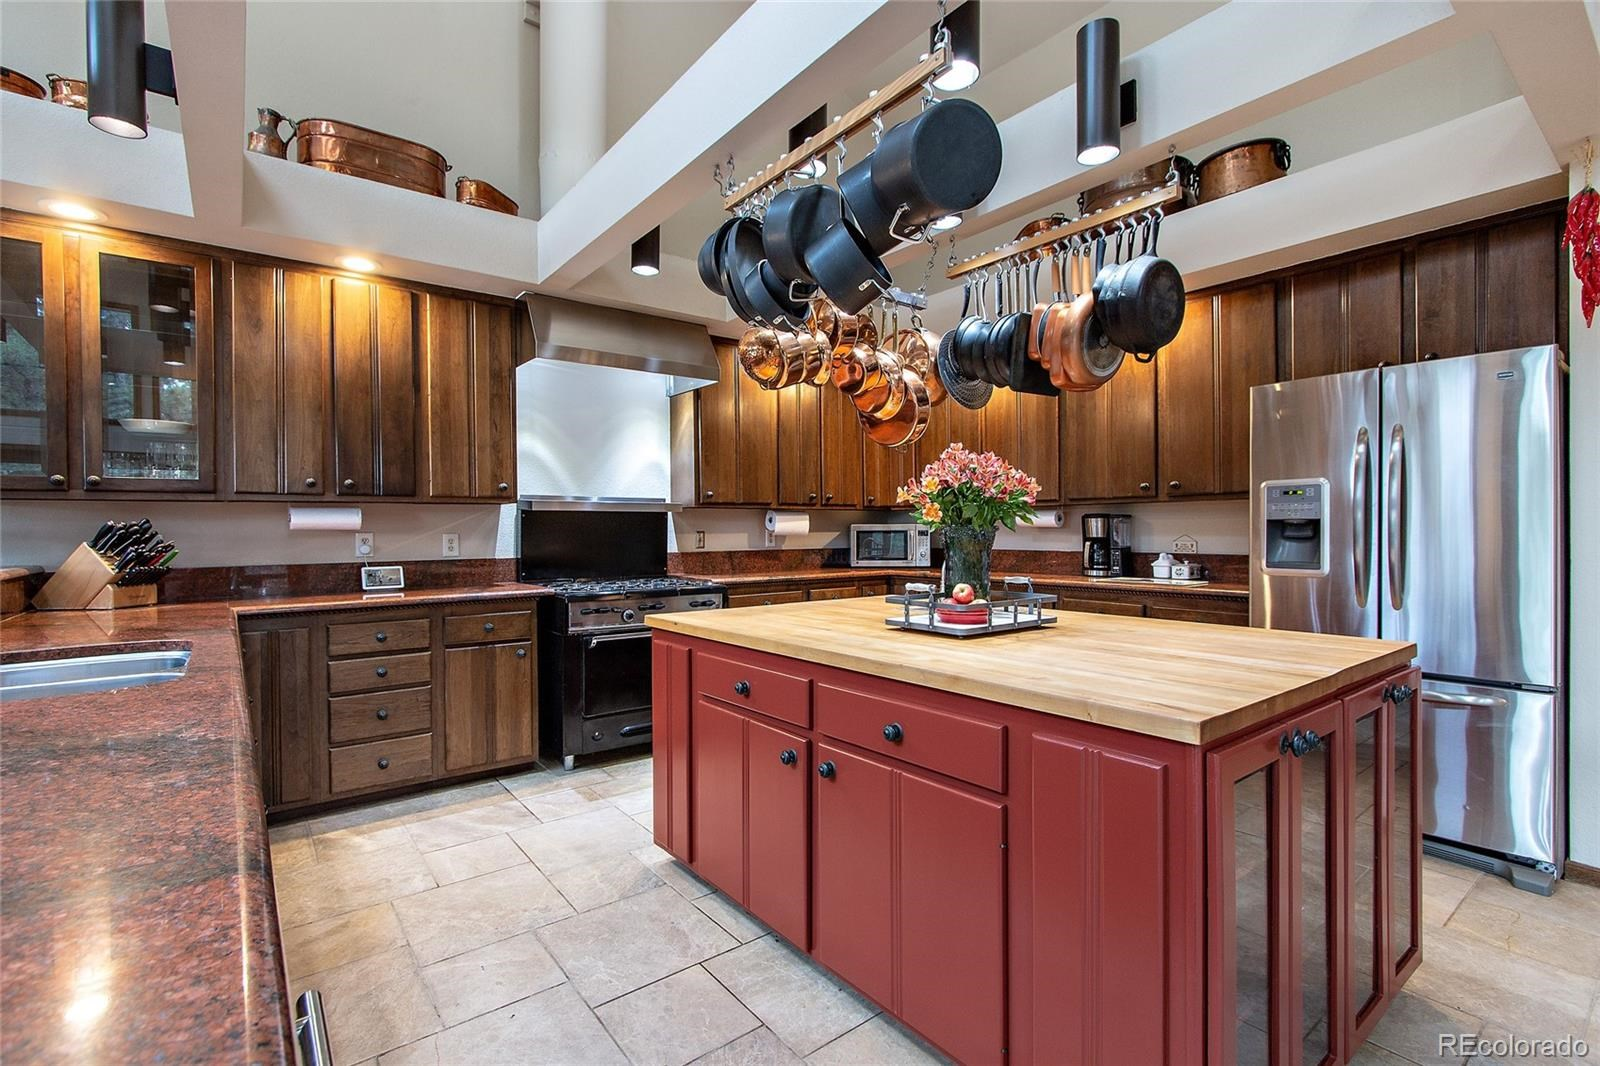 MLS# 1902527 - 14 - 29080 Pinewood Vista Drive, Evergreen, CO 80439